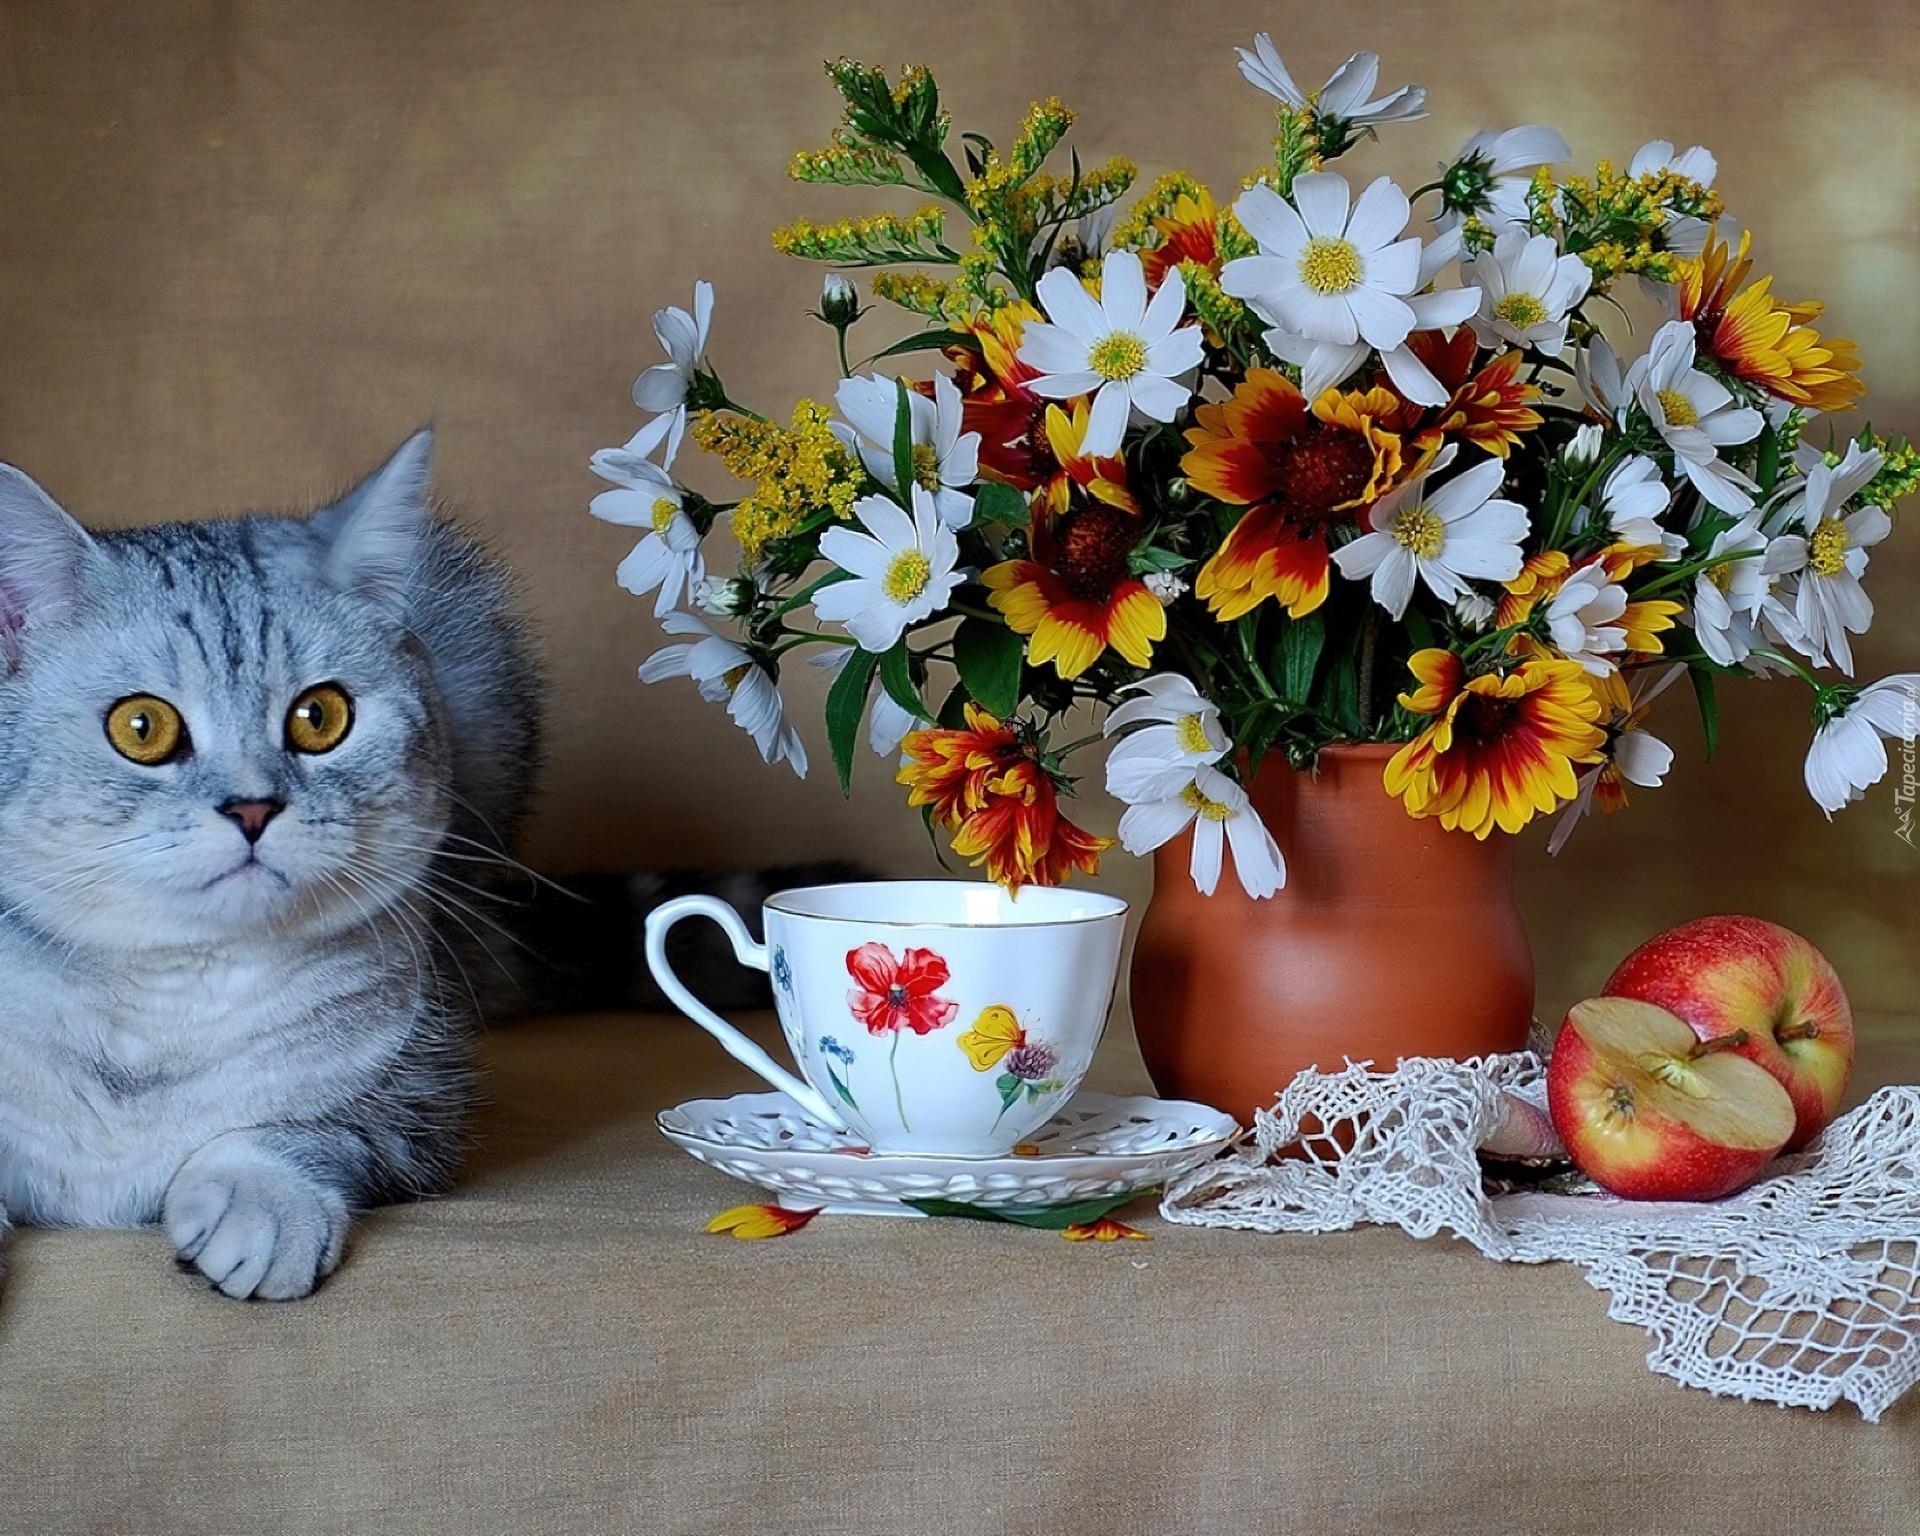 Картинки с кошечками доброго утра